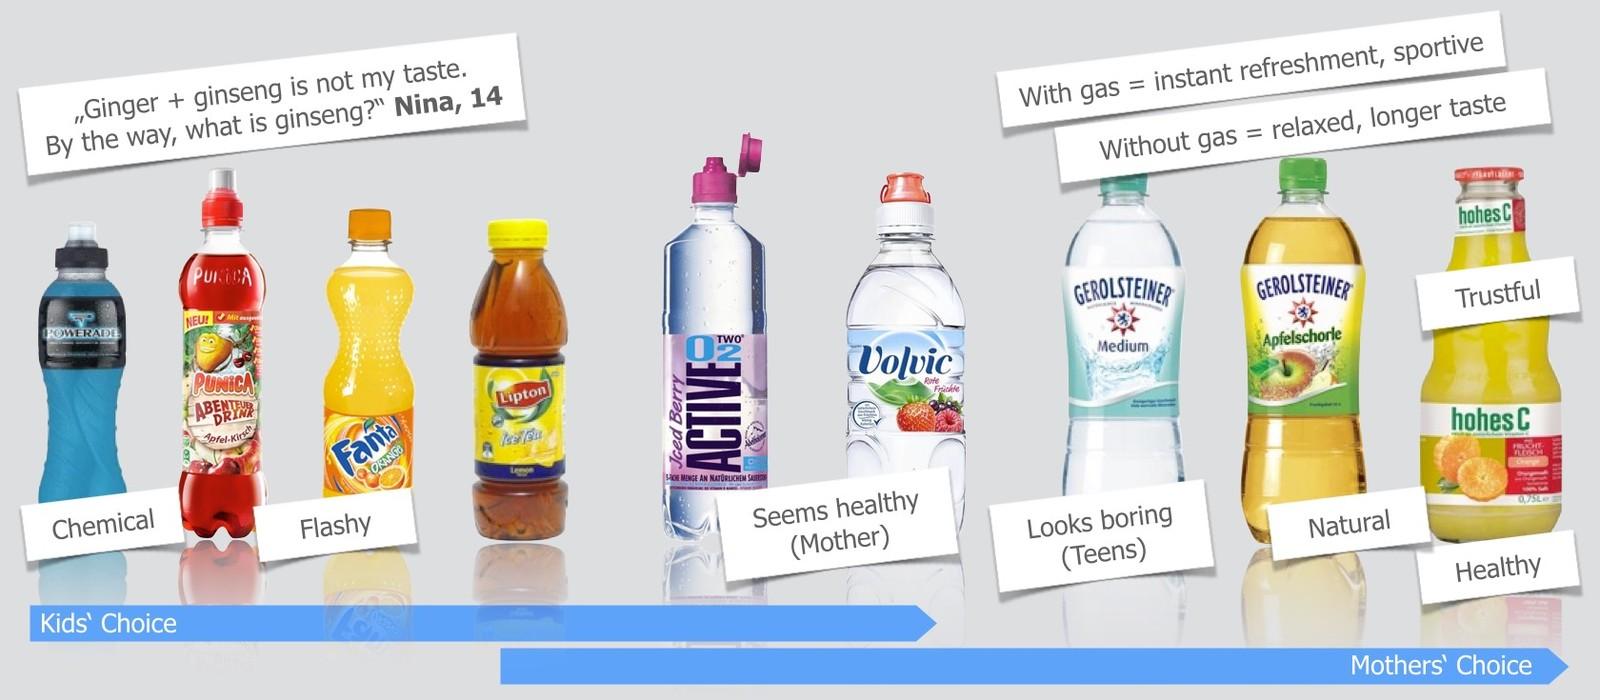 Squareone GmbH   Pepsico - Punica